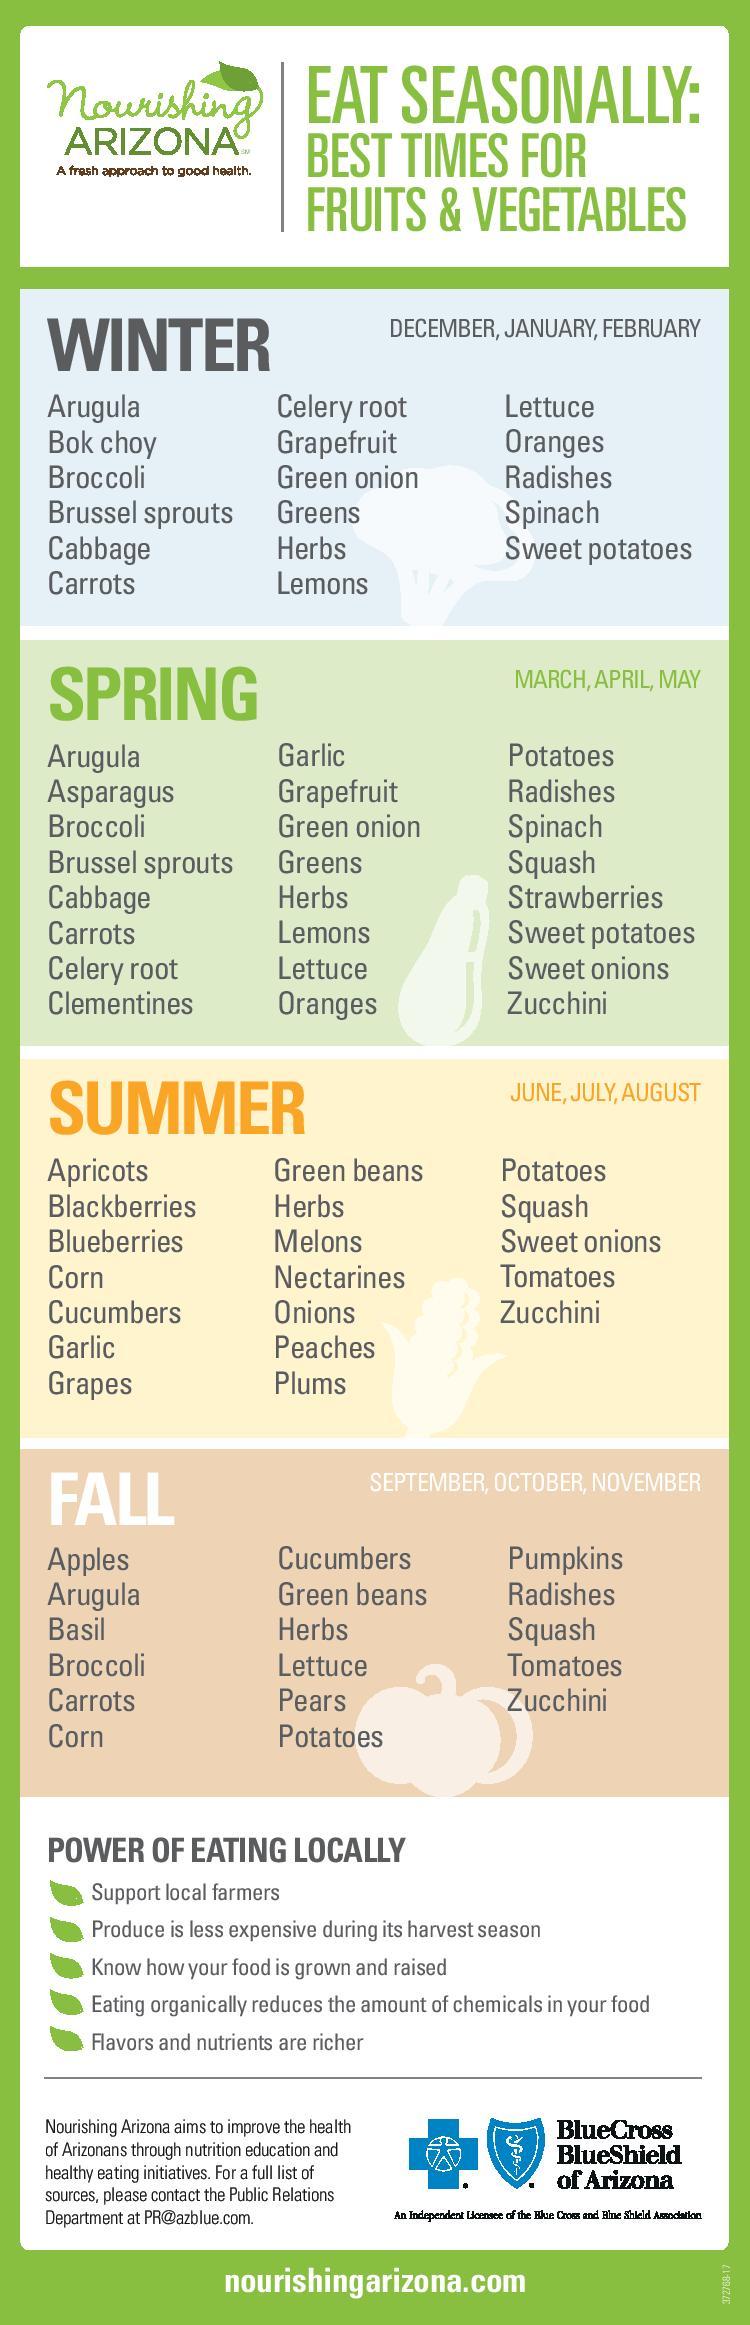 Learn to eat healthier my choosing fresh veggies.